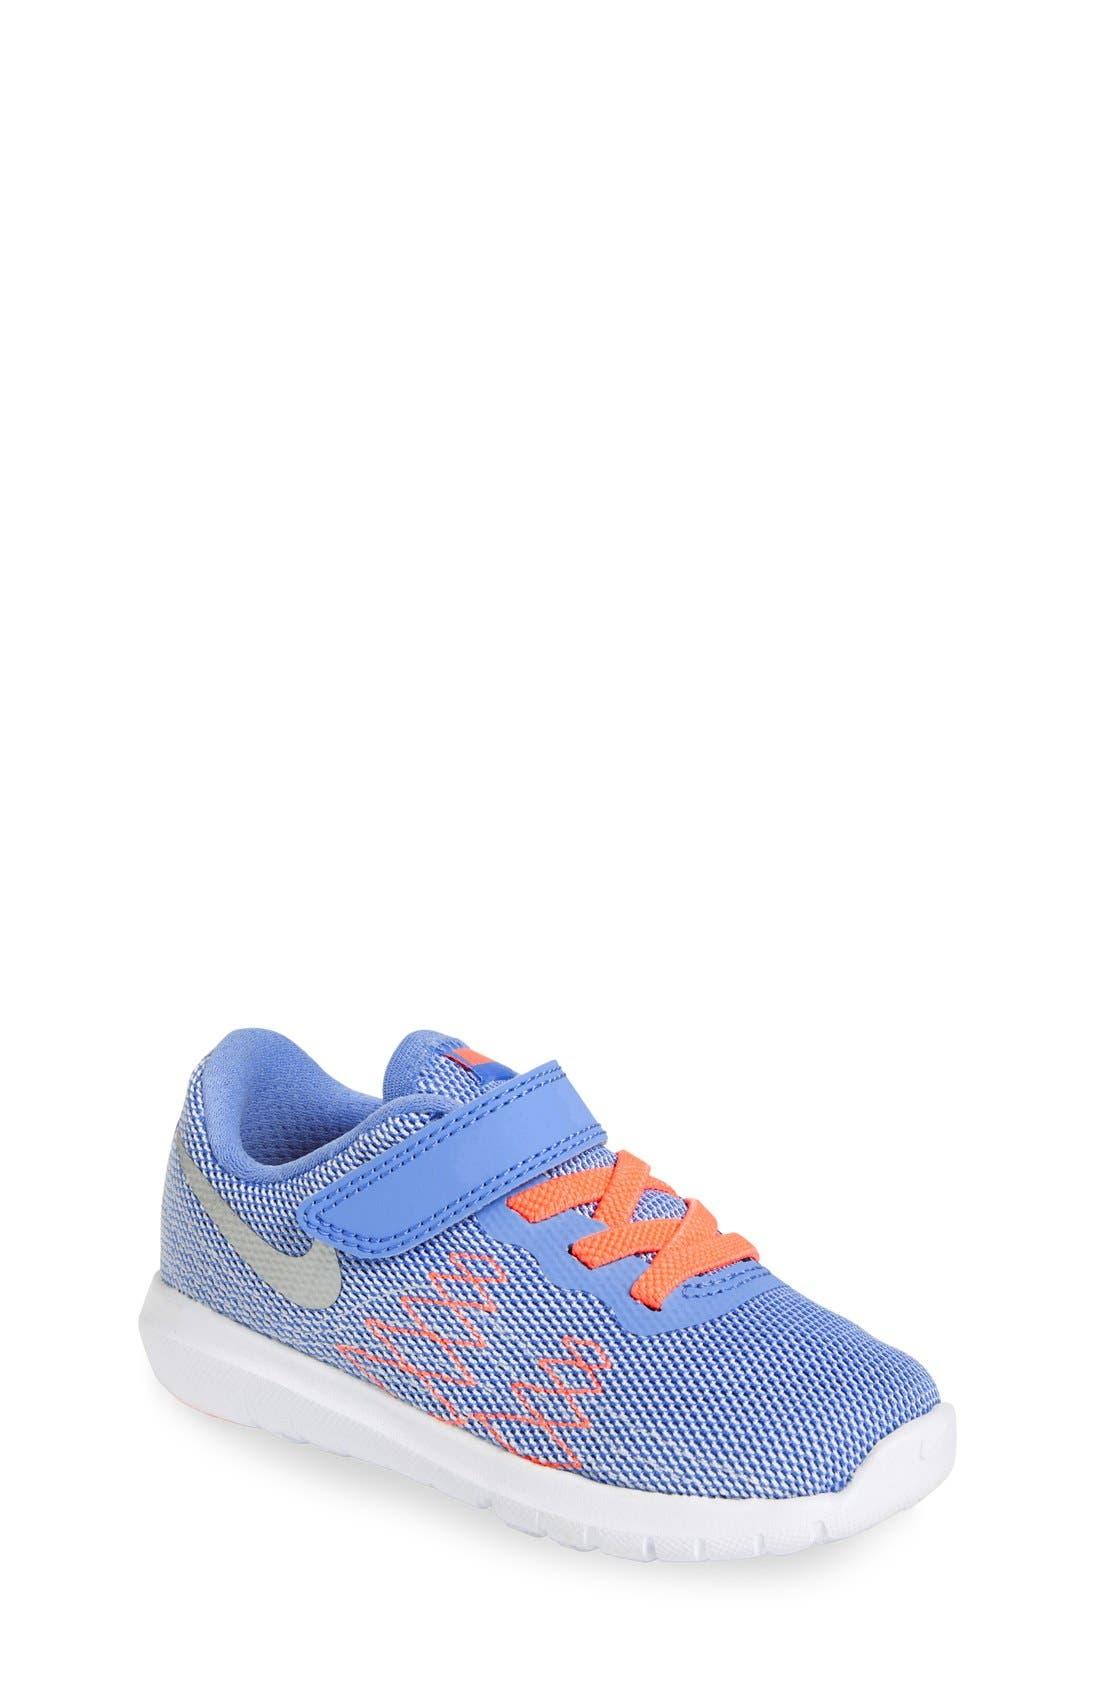 Nike Flex Fury 2 Athletic Shoe (Baby, Walker & Toddler)